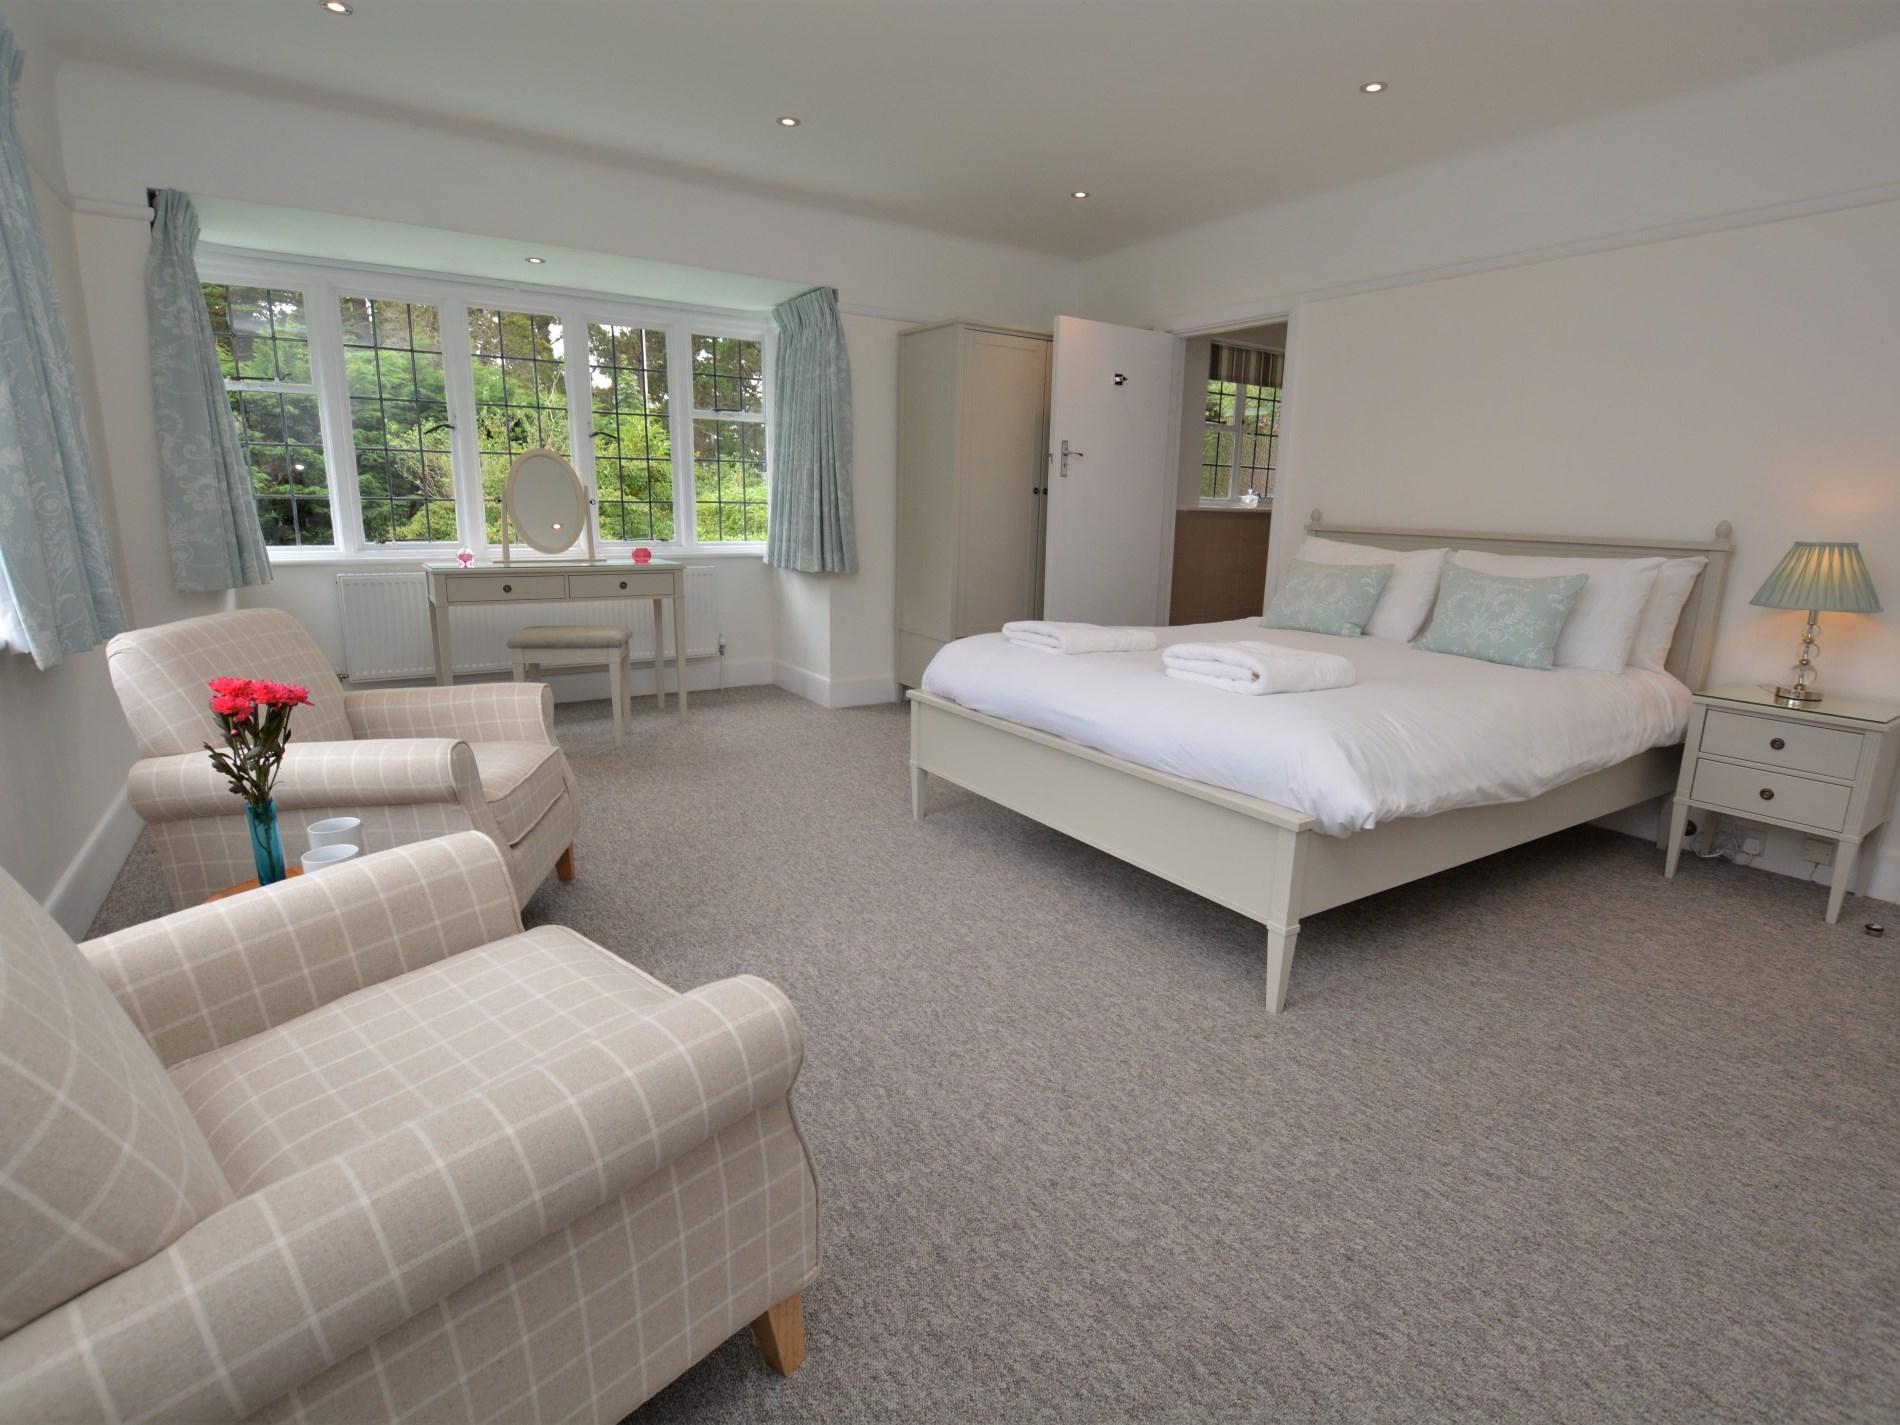 King-size bedroom with en-suite shower room